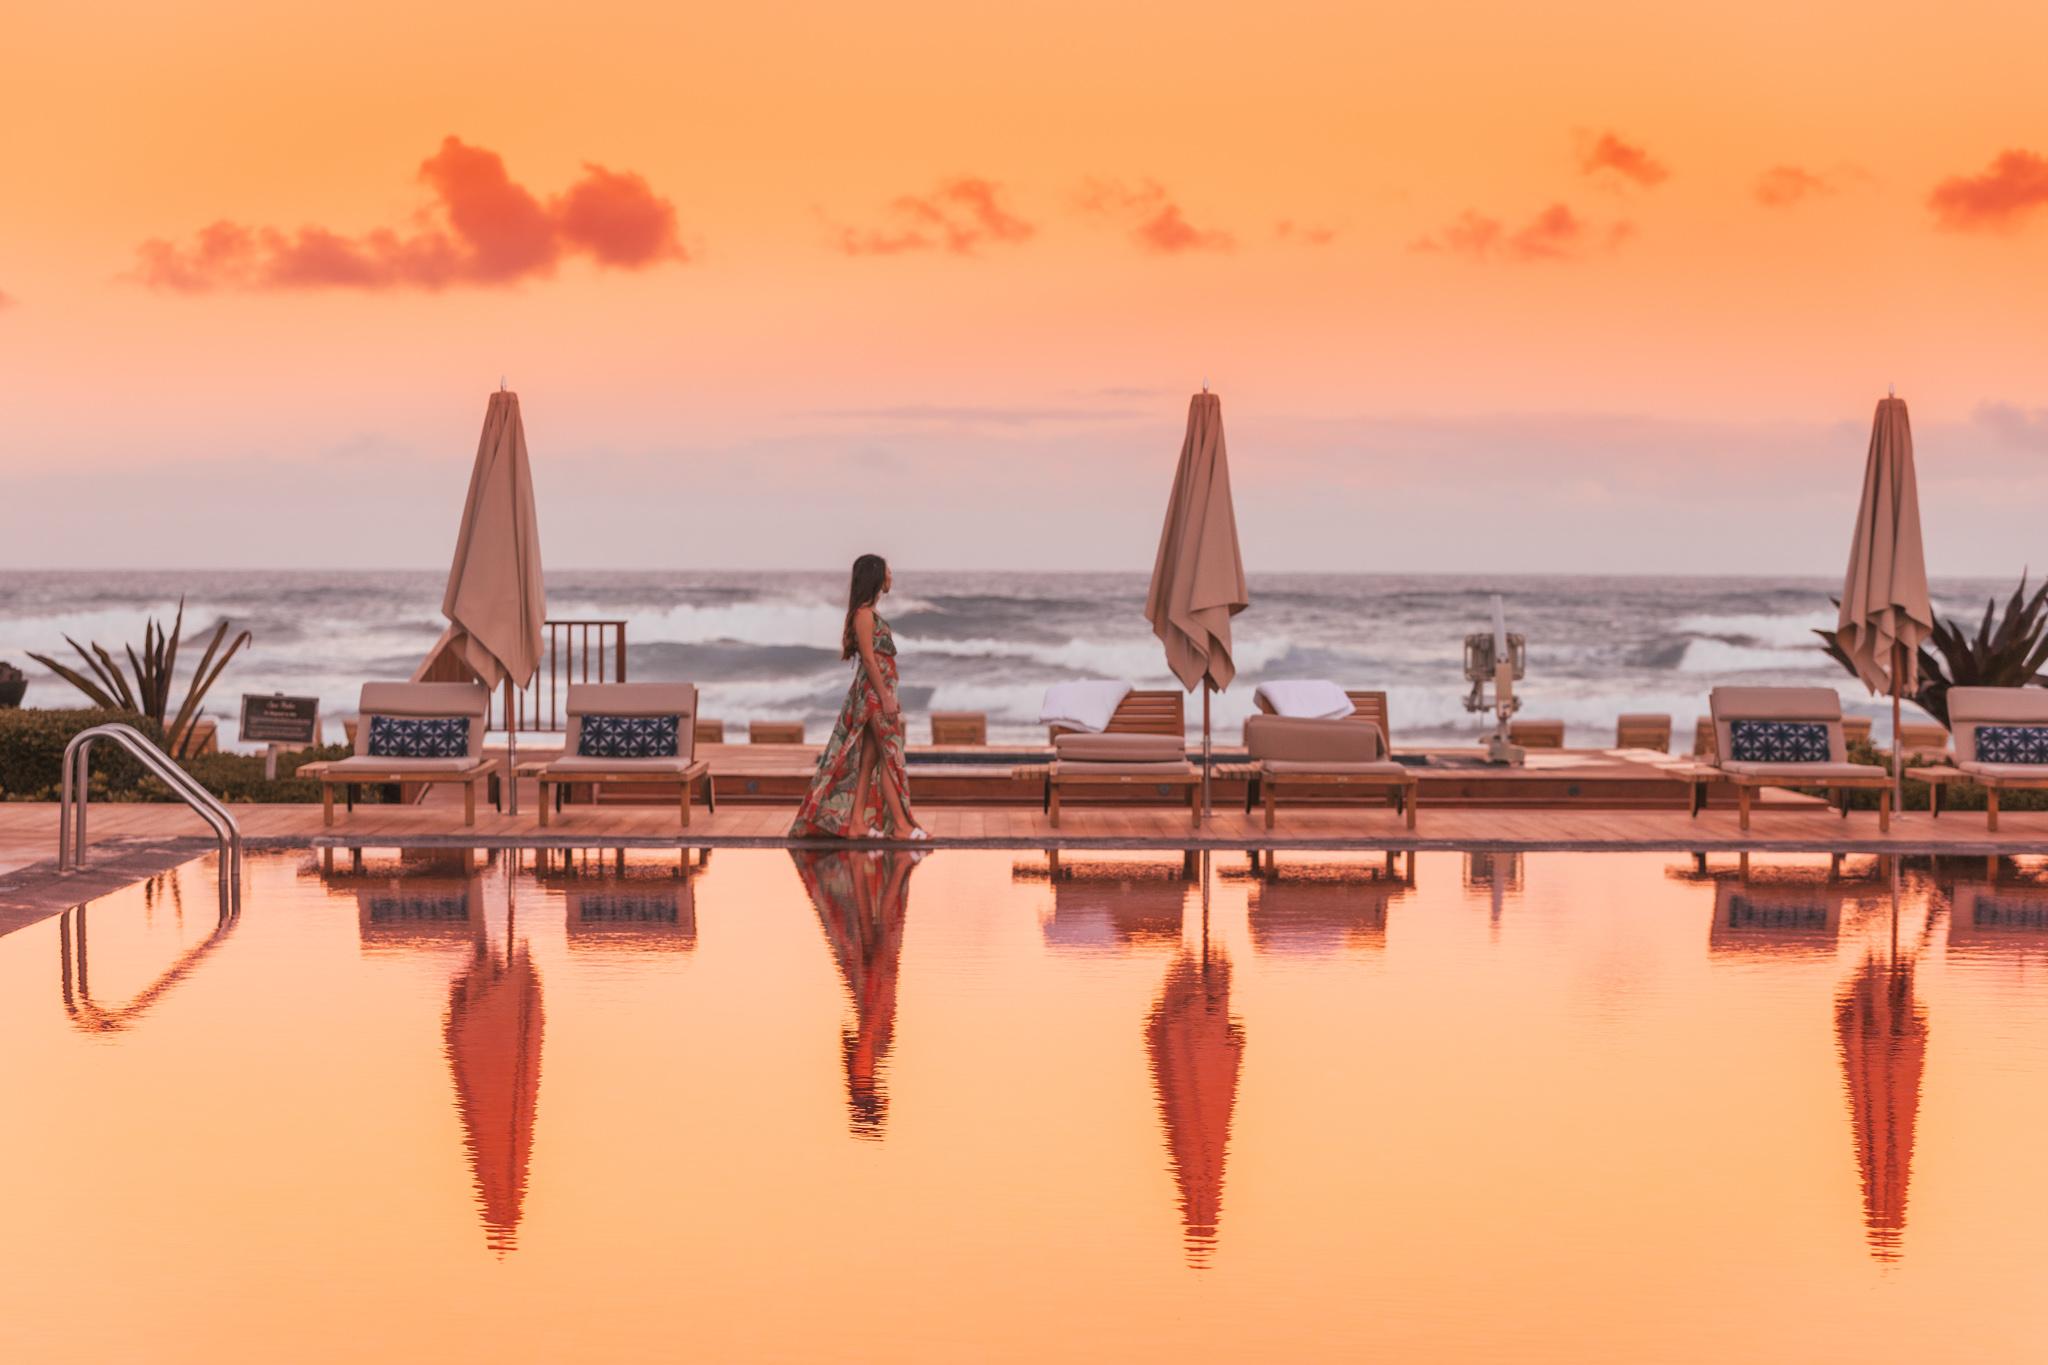 Beach Tree Pool sunset // A Luxury Stay on the Big Island: Four Seasons Resort Hualalai // #readysetjetset #hawaii #bigisland #luxuryhotels #beachresorts #usa #travel